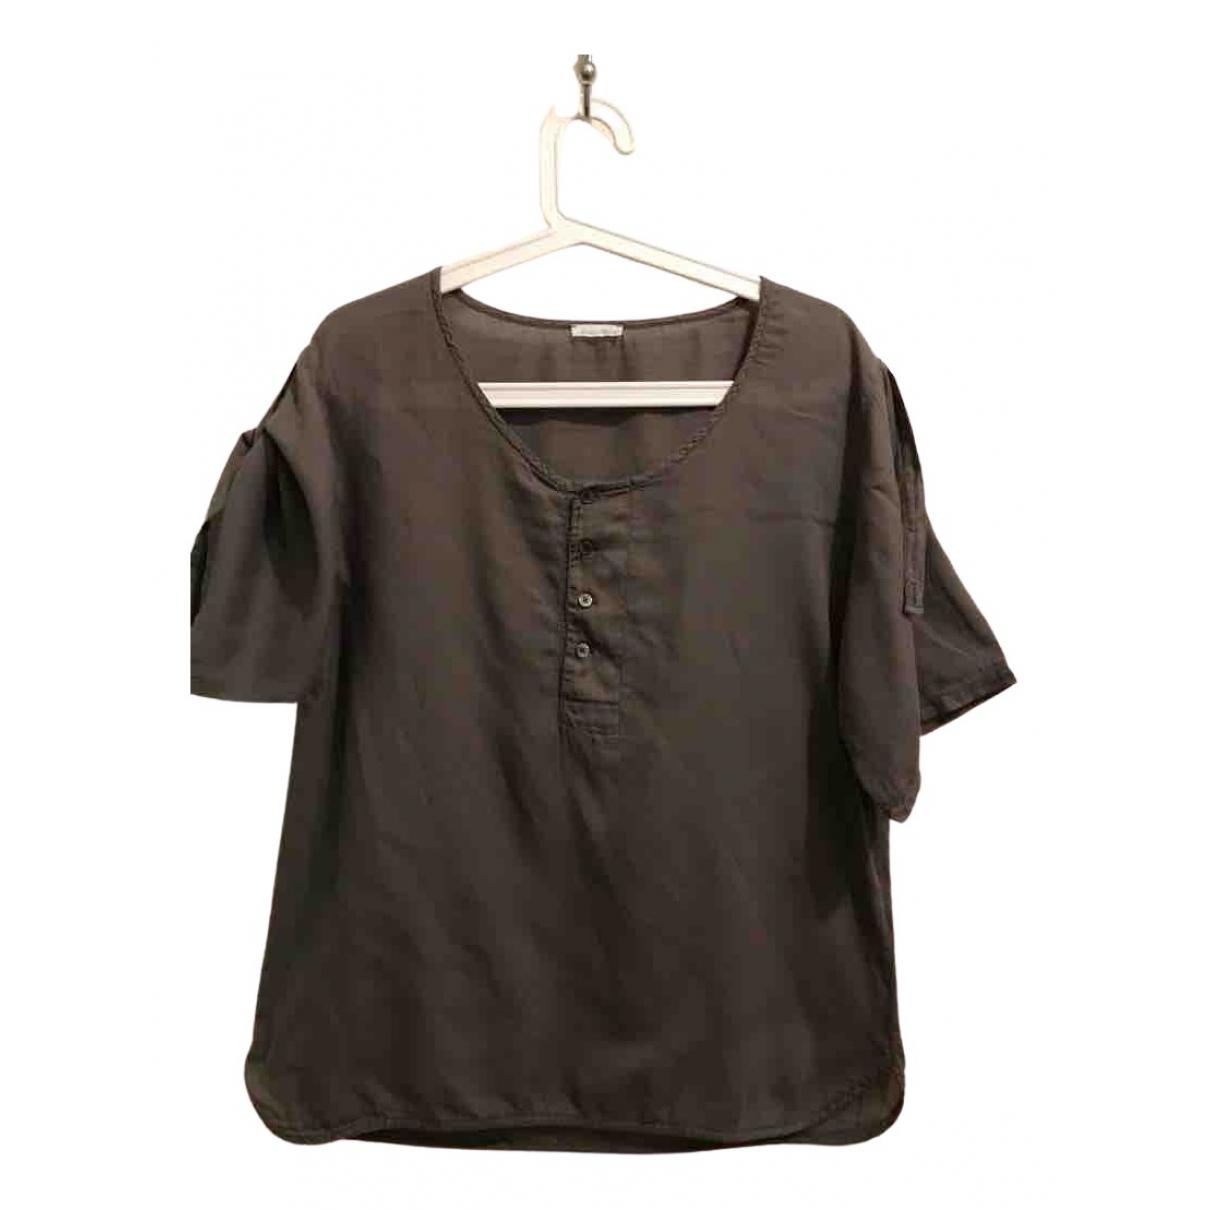 American Vintage \N Cotton  top for Women S International